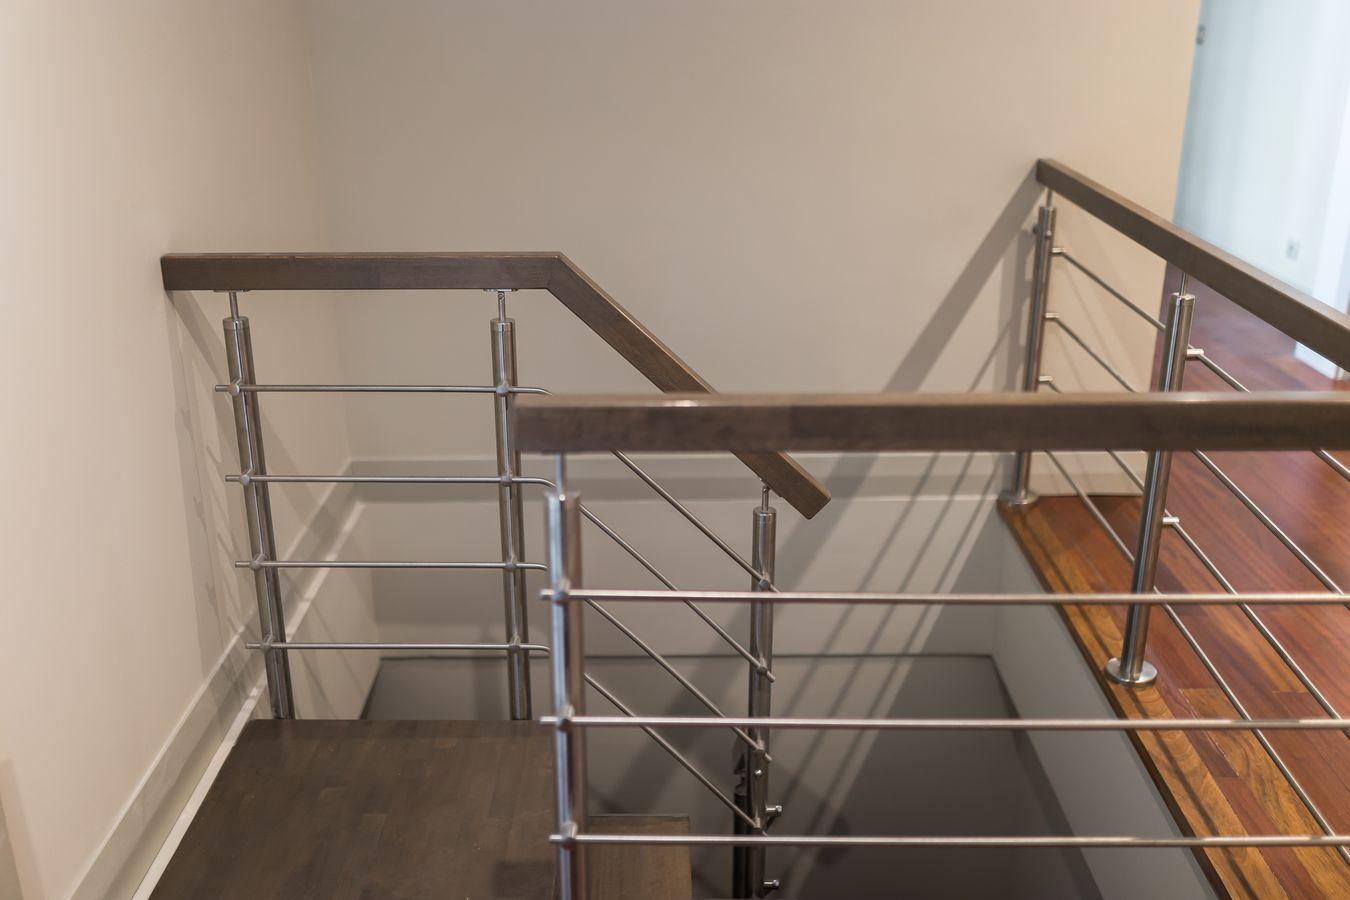 Reforma Integral Casa Soto de la Moraleja - Detalle escalera